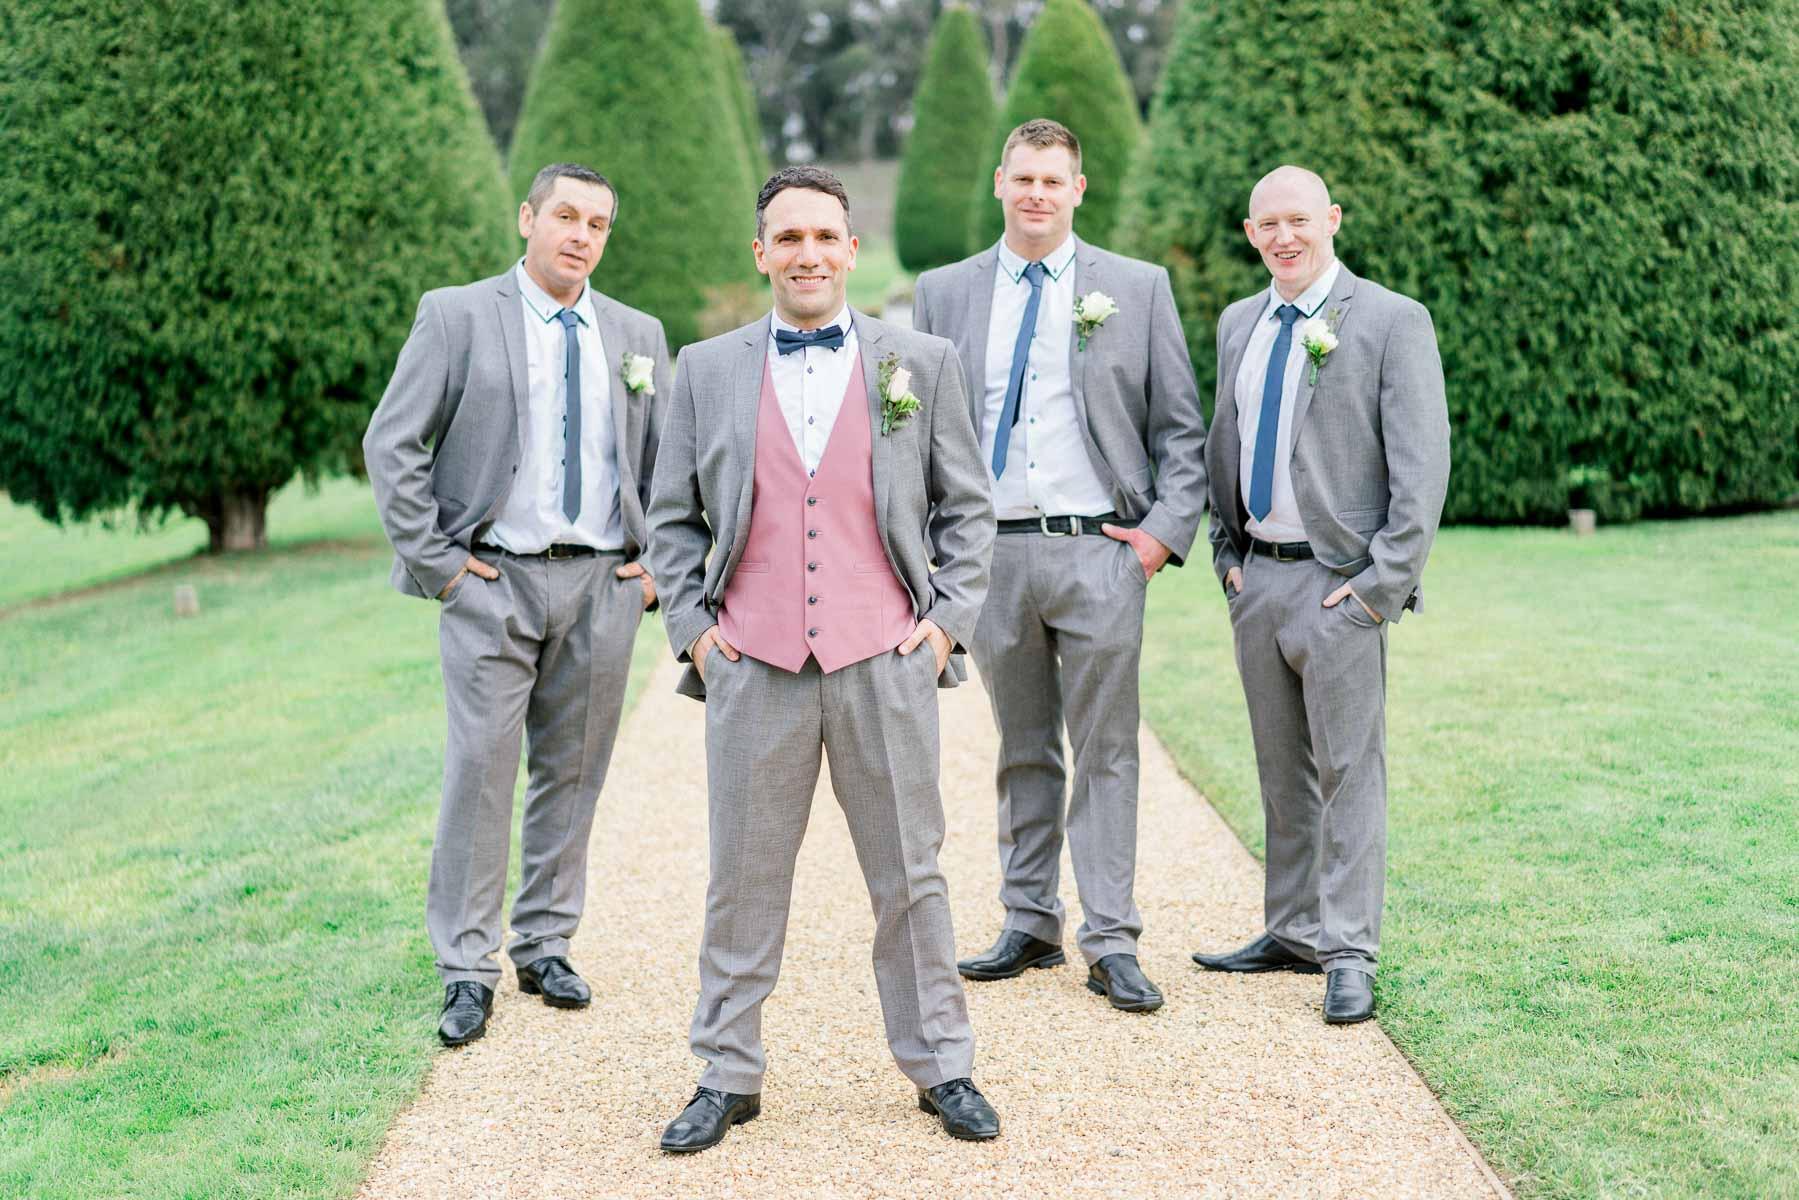 lindenderry-wedding-heart+soul-weddings-amy-alain-03640.jpg